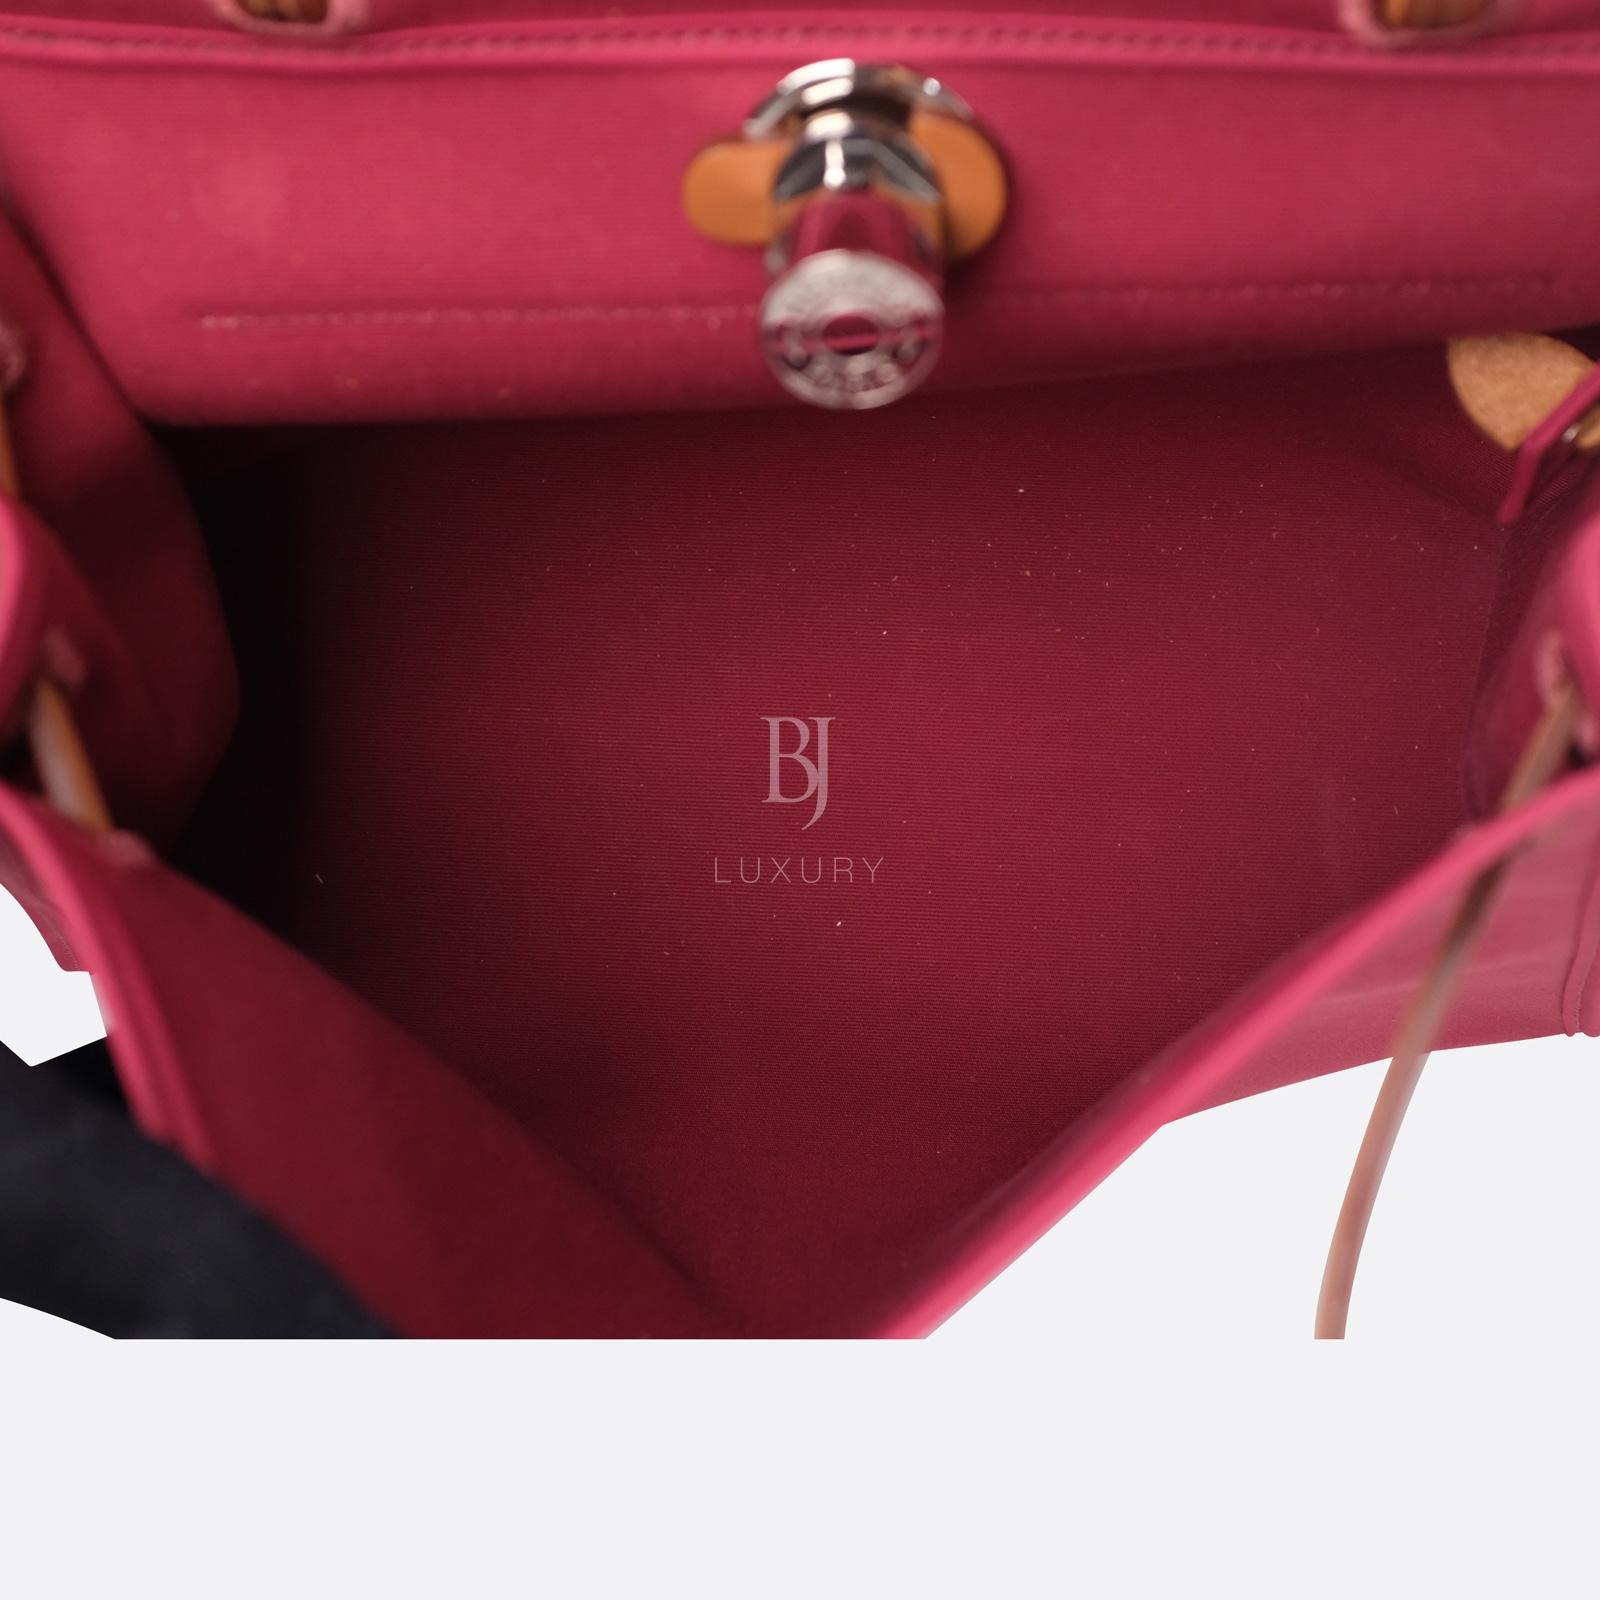 Hermes Herbag 31 Rubis Canvas Vache Palladium BJ Luxury 17.jpg